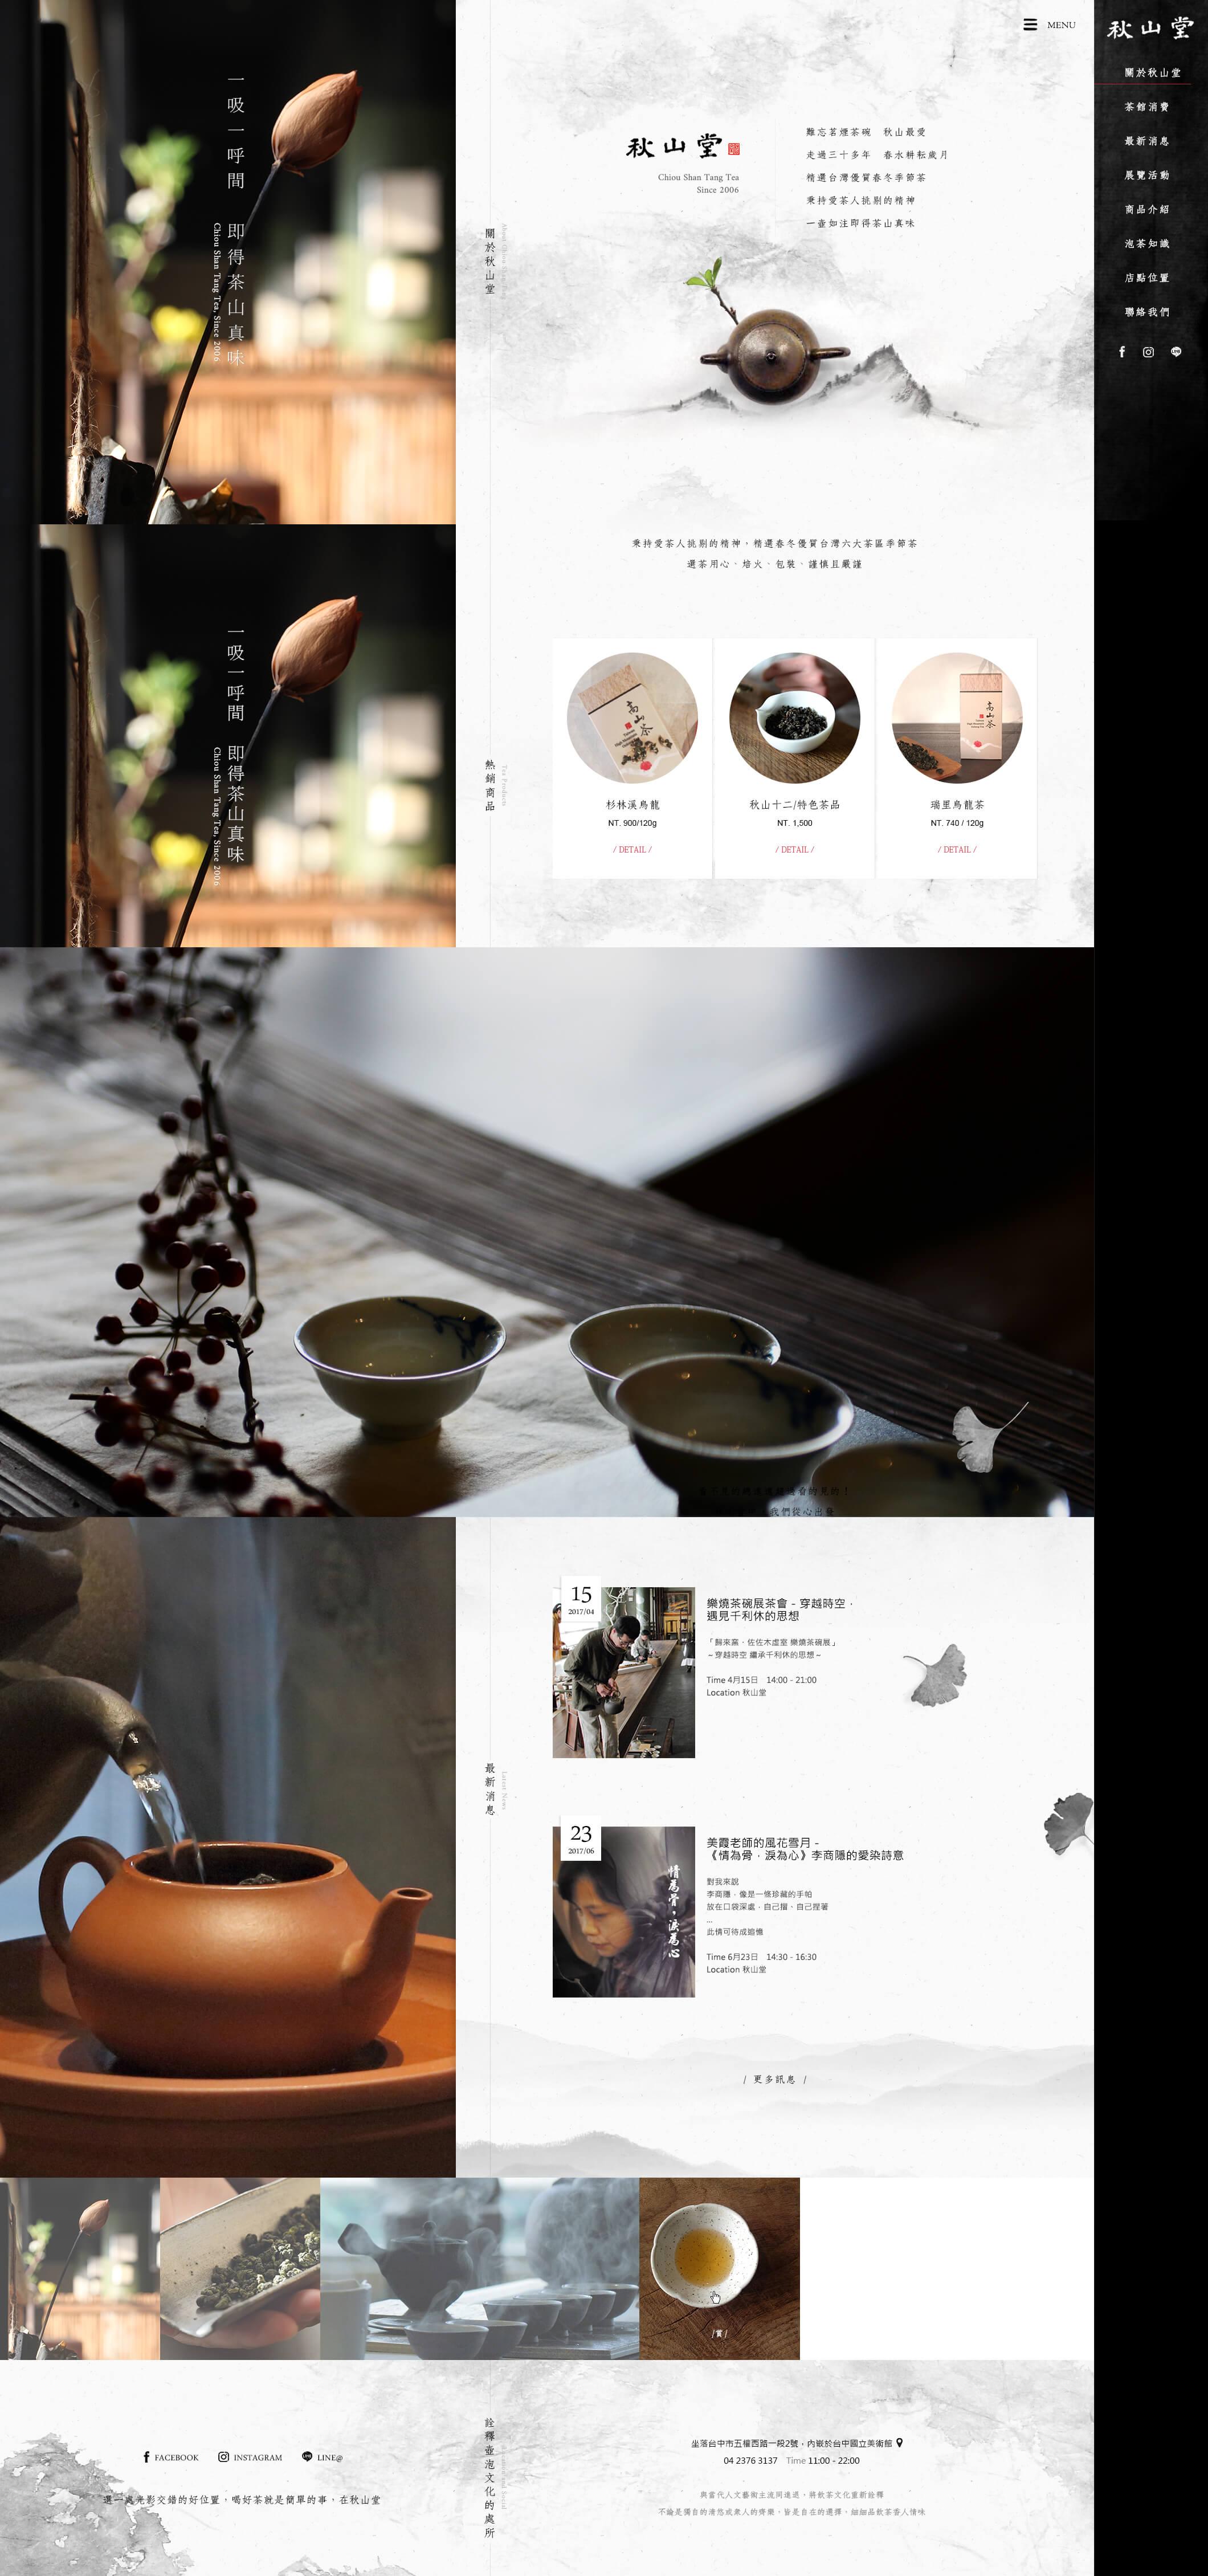 秋山堂-網頁設計